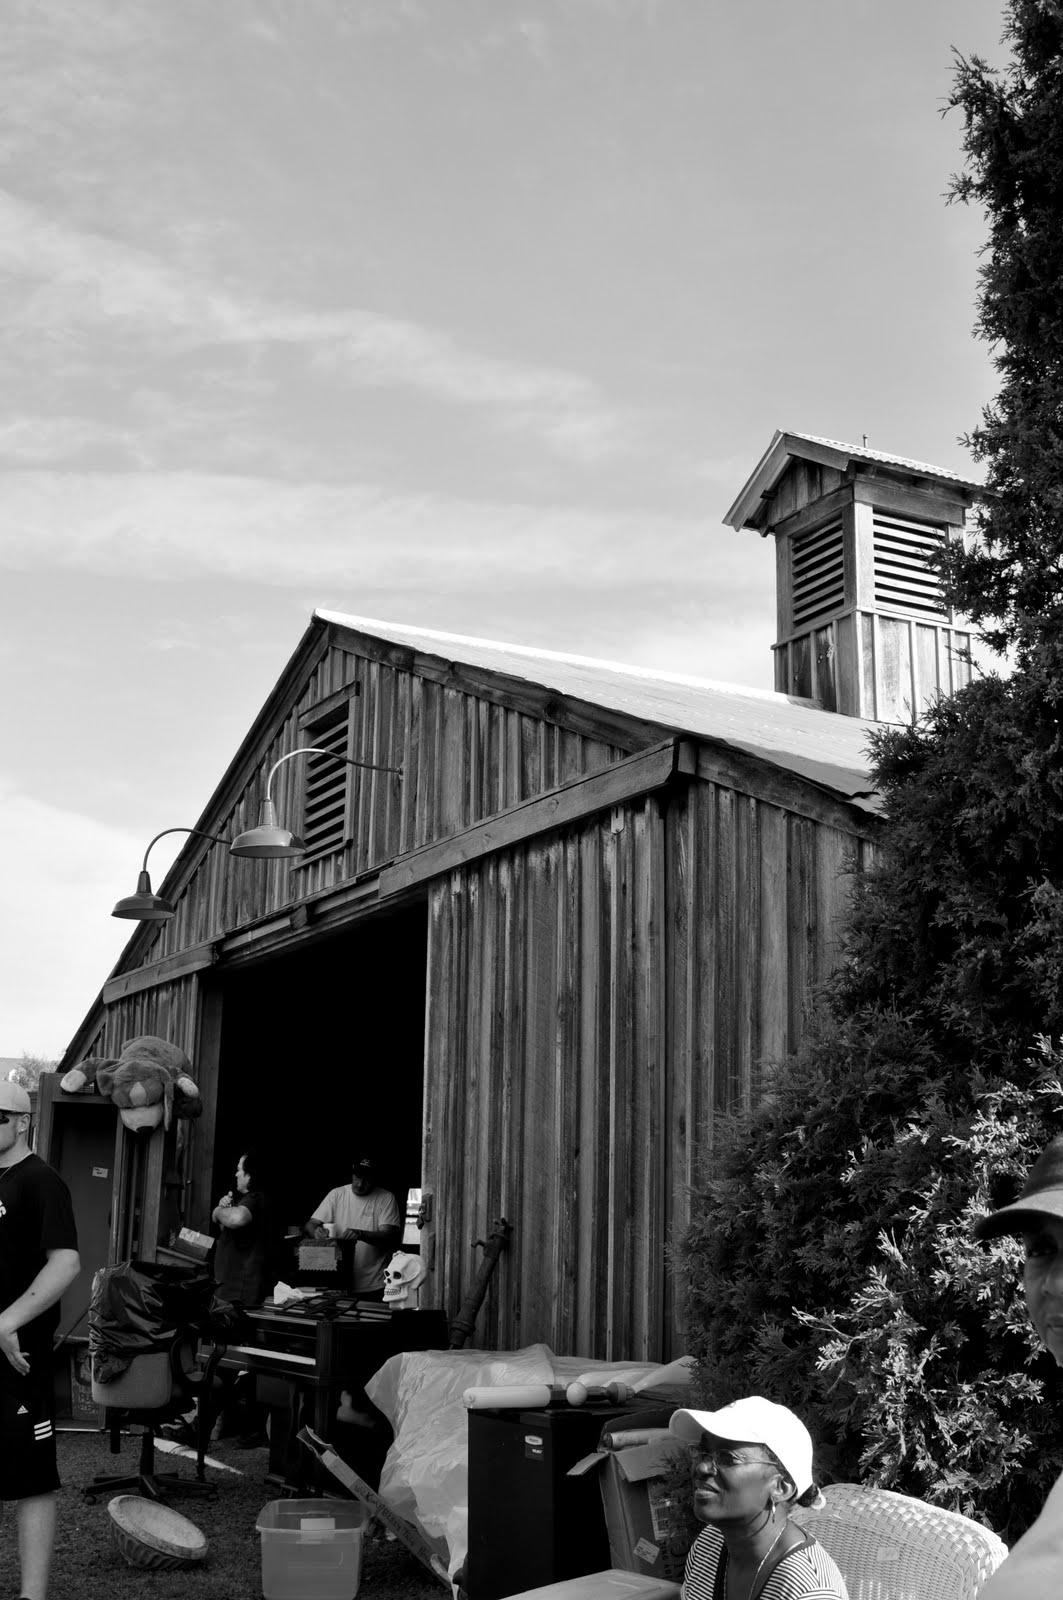 Horse Barn Plans For Sale 8x10x12x14x16x18x20x22x24 Josep